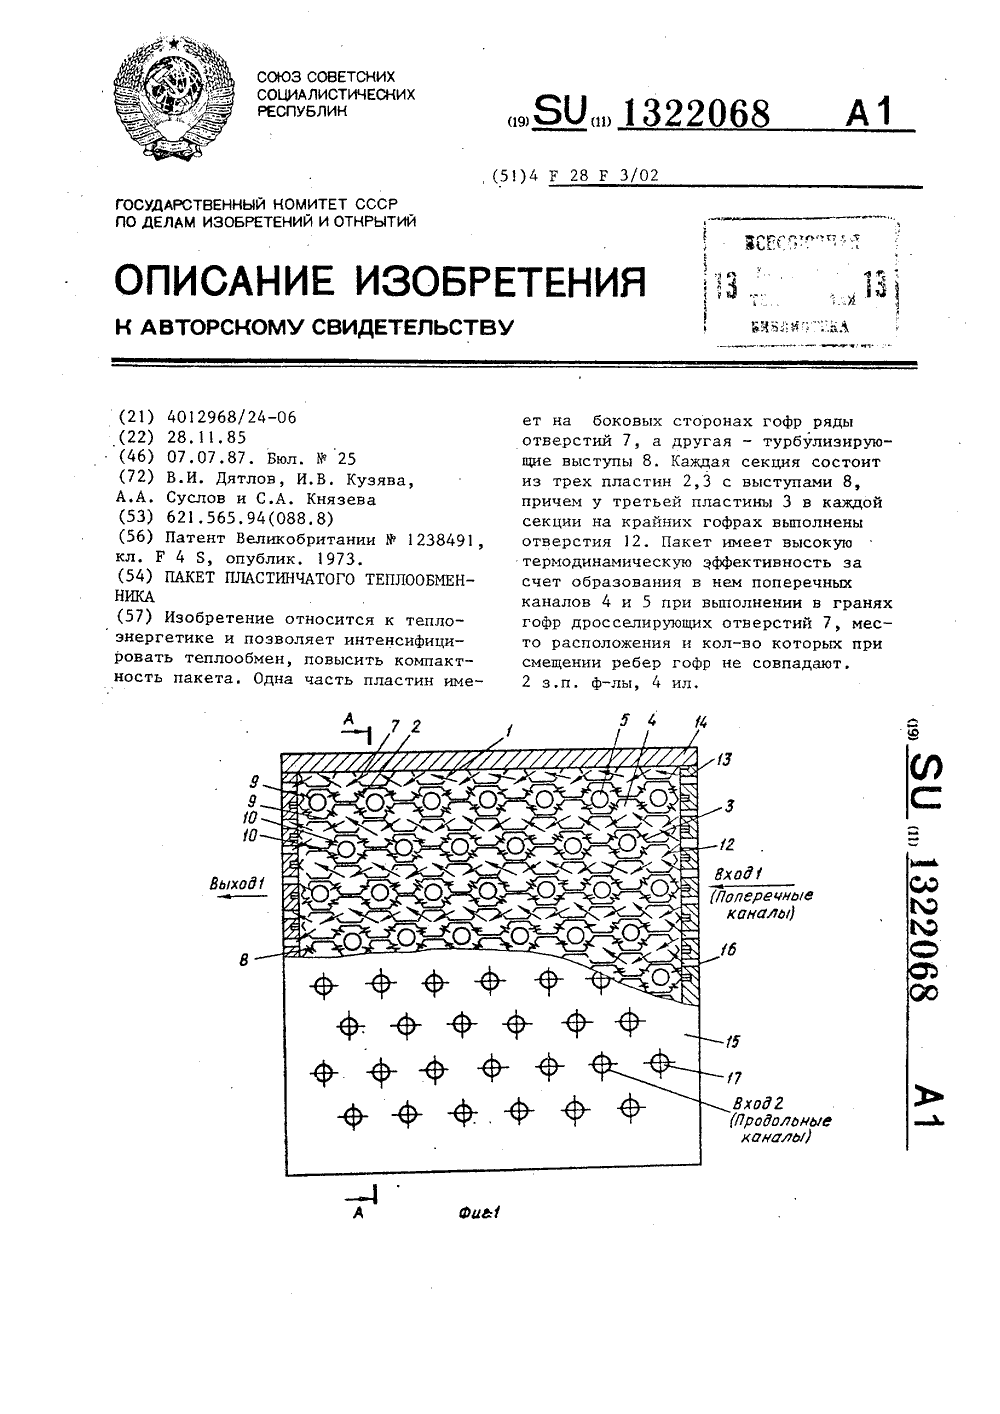 Кожухотрубный конденсатор WTK CF 25 Москва